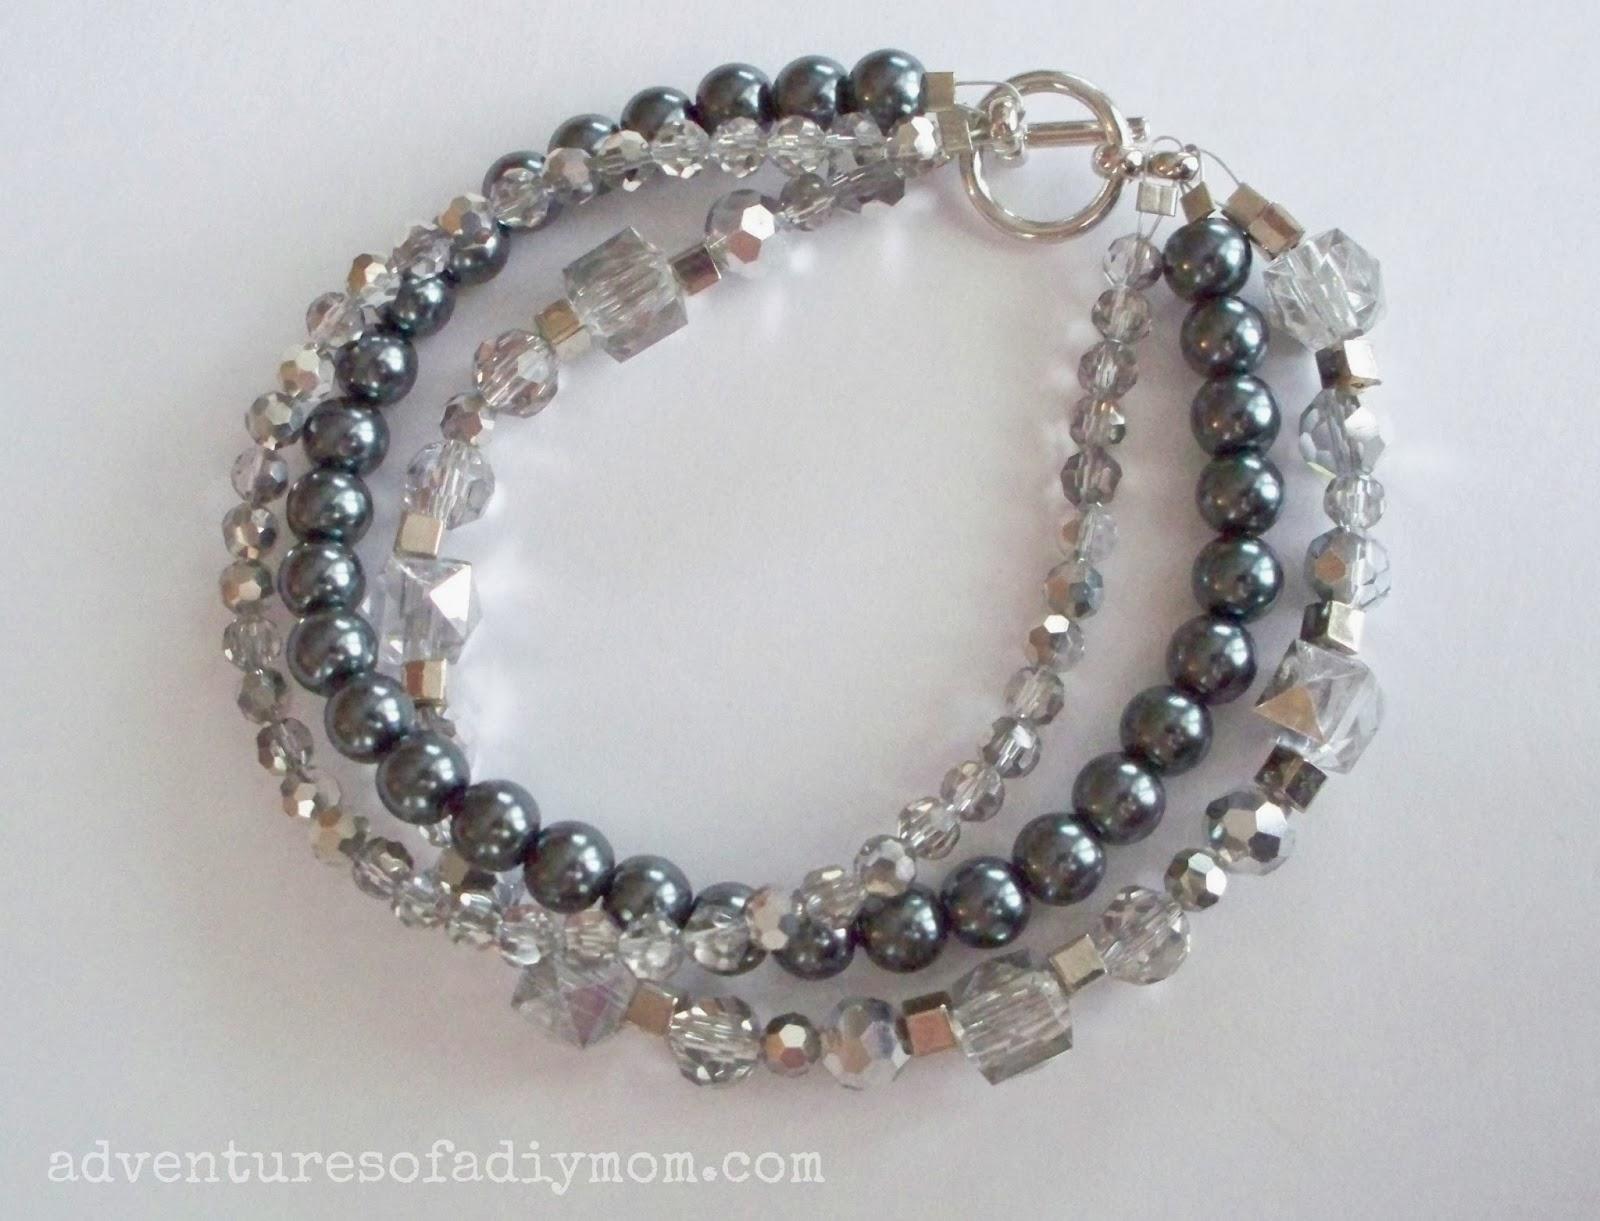 How to Make a Three Stranded Bracelet - Adventures of a DIY Mom